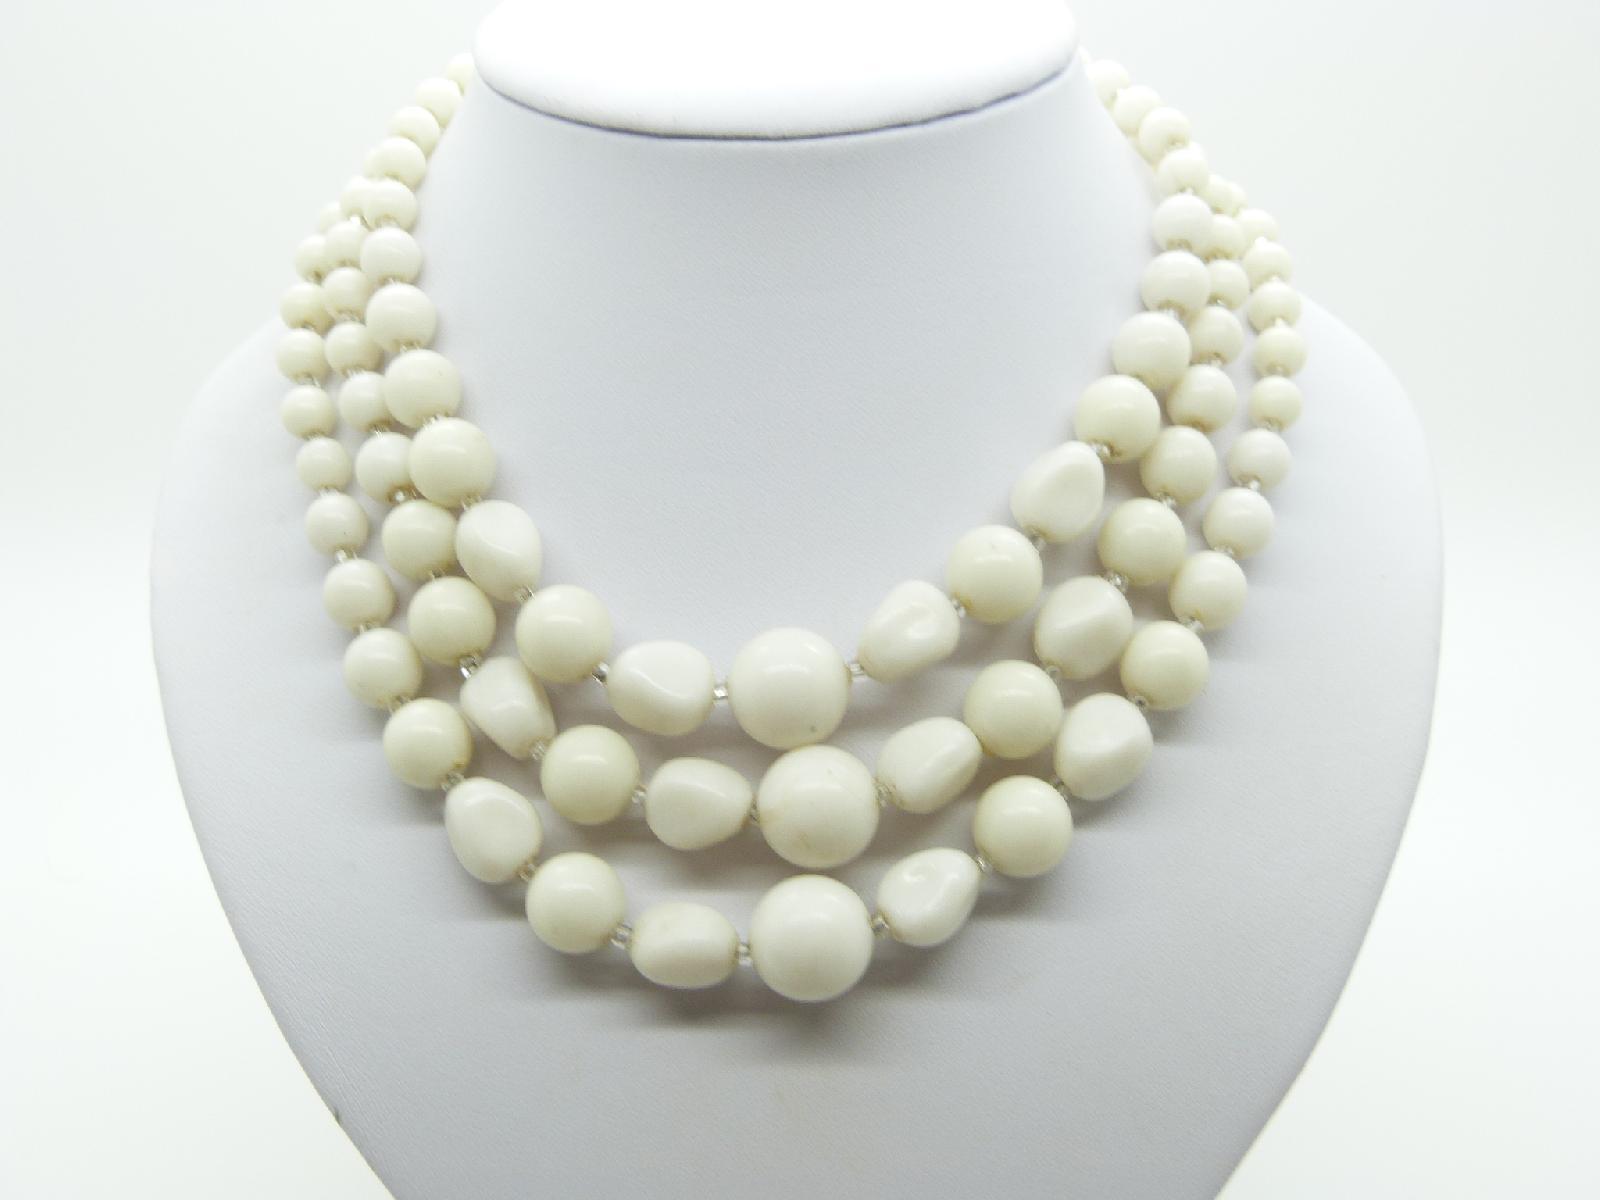 £12.00 - Vintage 50s Three Row Pretty White Plastic Bead Necklace Unusual Shape